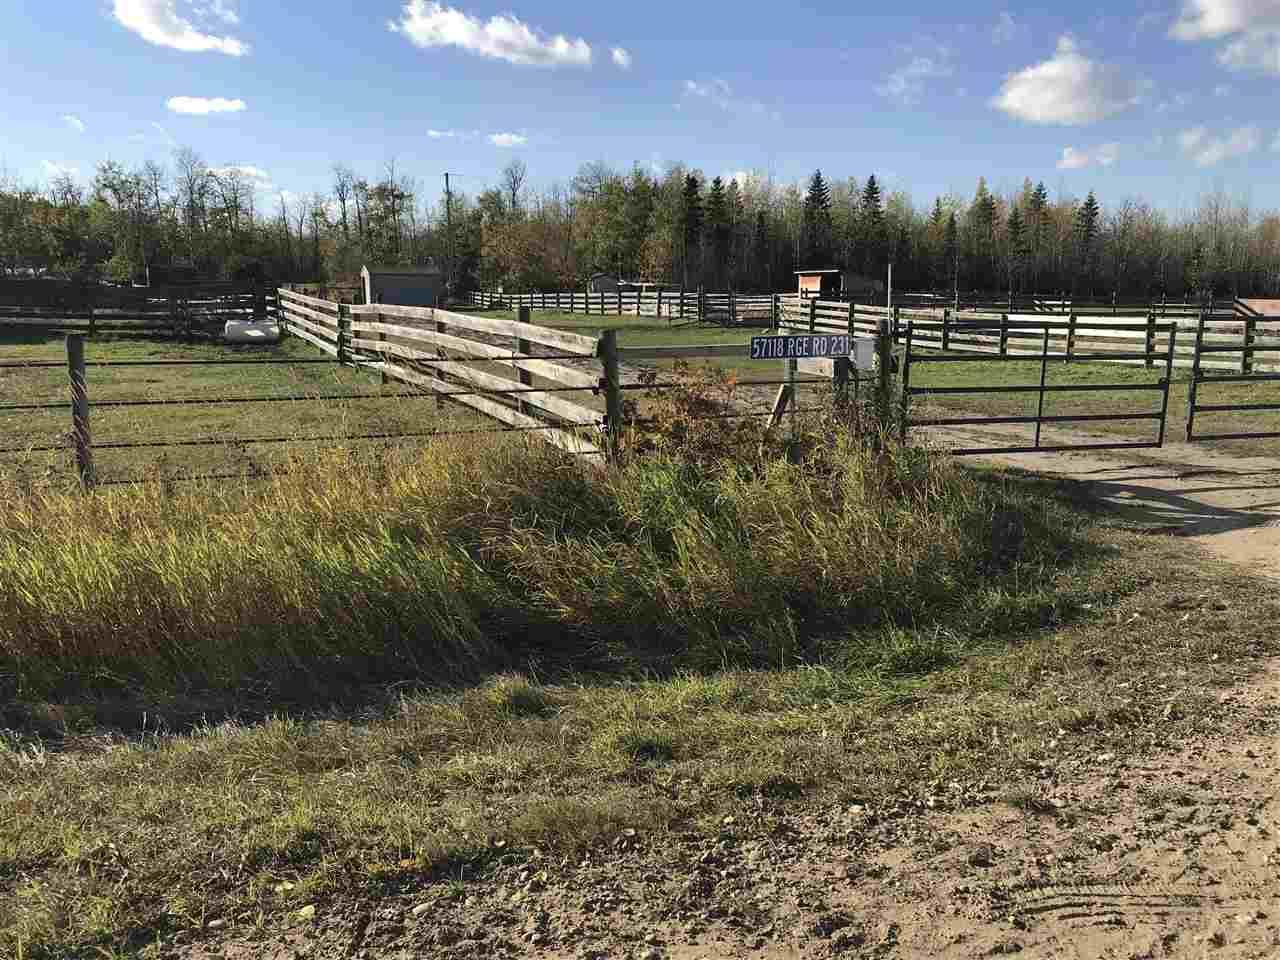 Main Photo: 57118 Range Road 231: Rural Sturgeon County Rural Land/Vacant Lot for sale : MLS®# E4132283